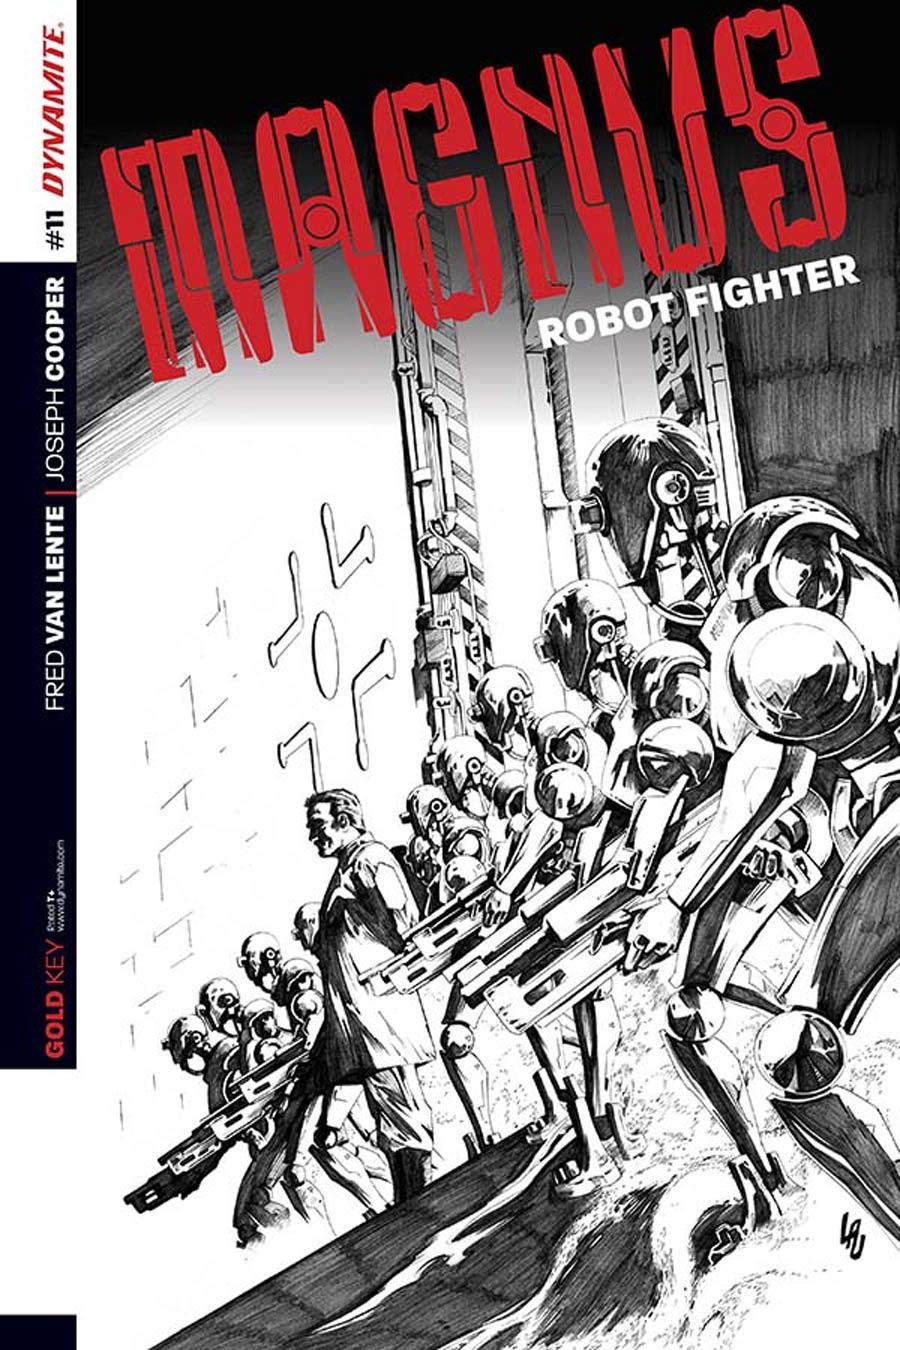 Magnus Robot Fighter Vol 4 #11 Cover C Incentive Jonathan Lau Black & White Cover